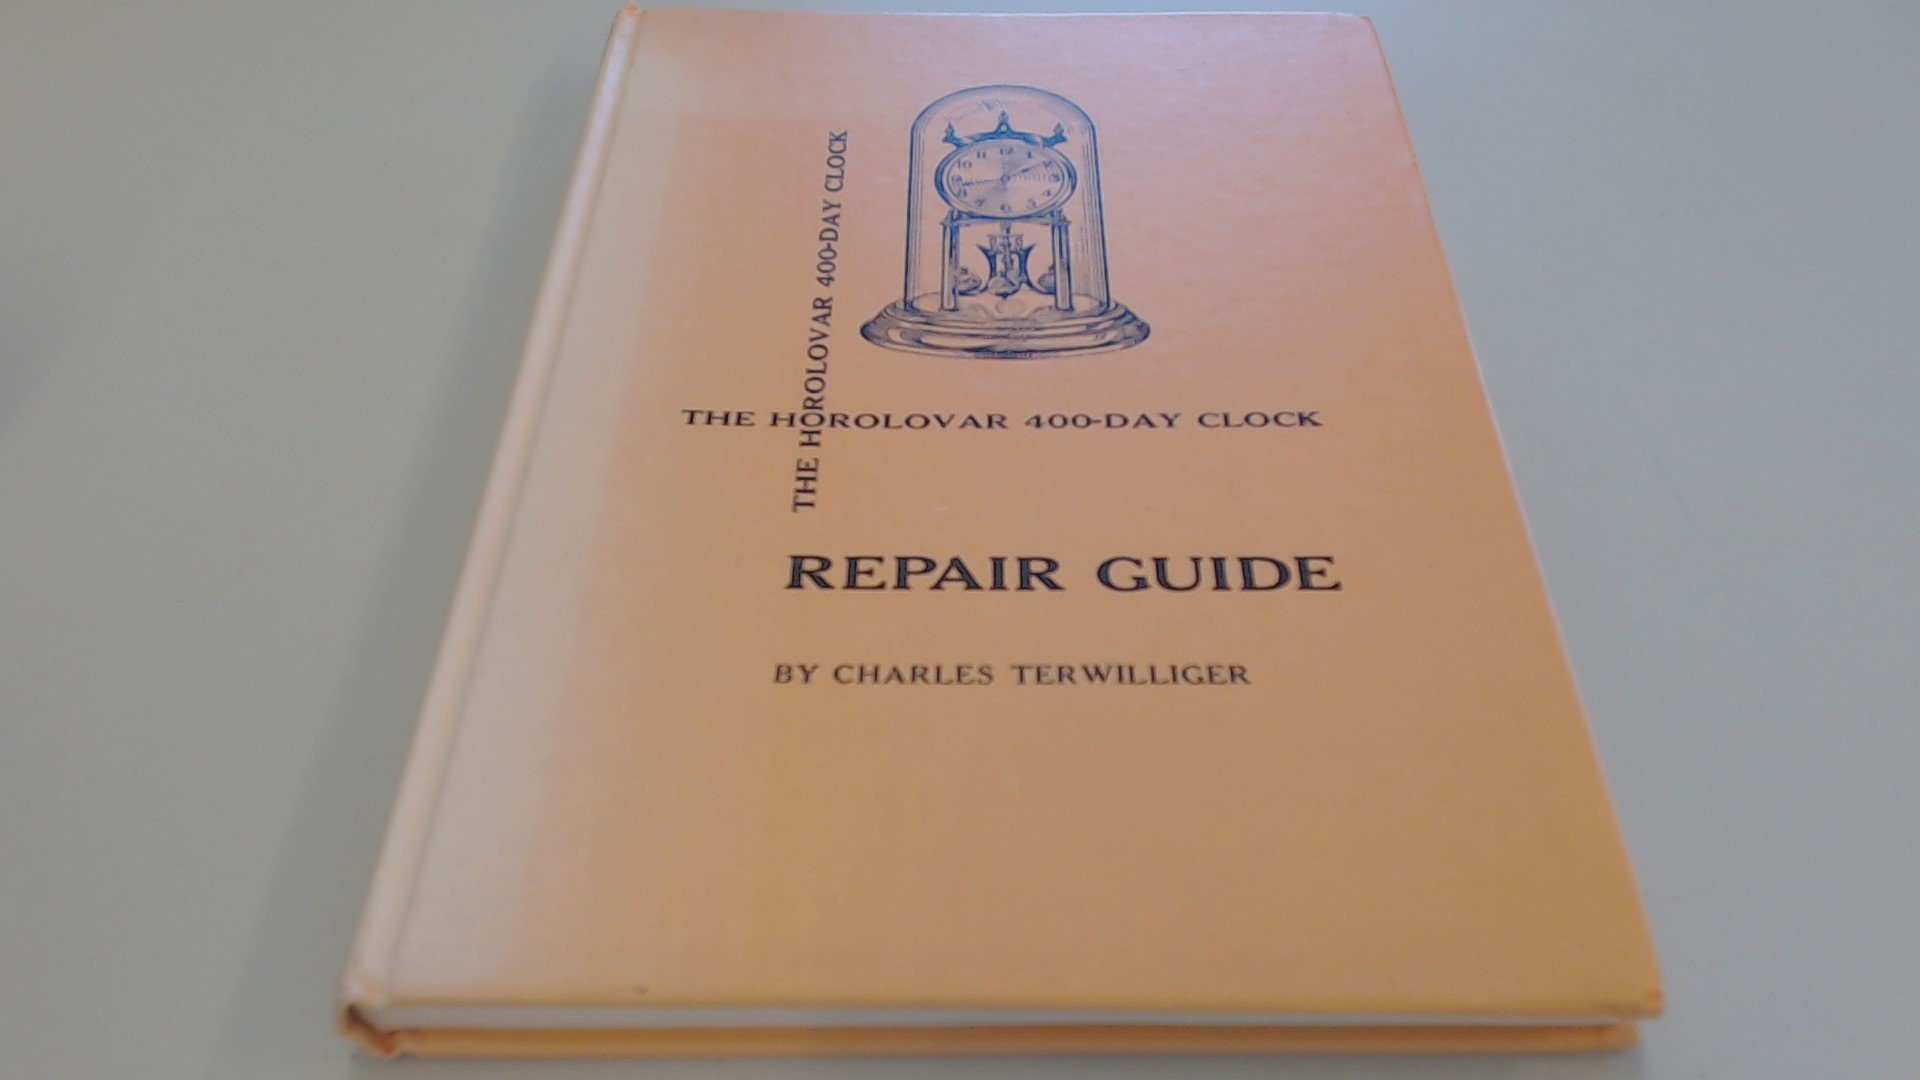 The Horolovar 400-day clock repair guide: Amazon.co.uk: Charles  Terwilliger: 9780916316006: Books